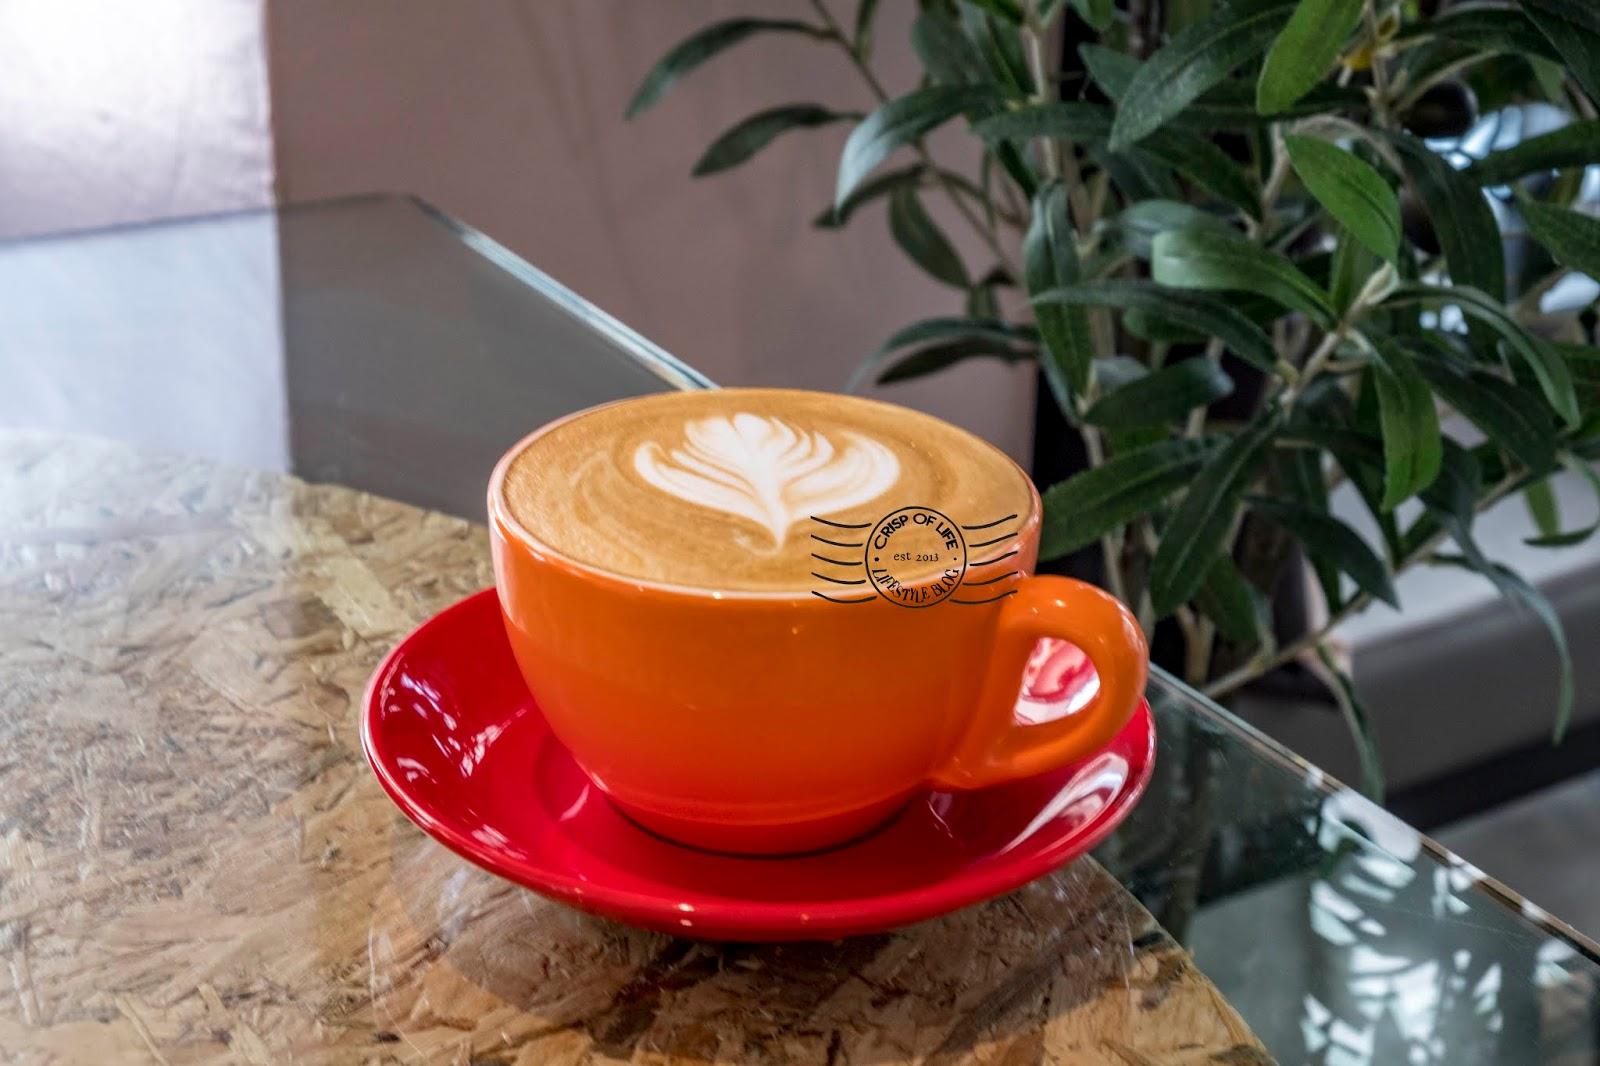 Have A Seat Lifestyle Cafe 坐坐吧 at Tanjung Tokong, Penang